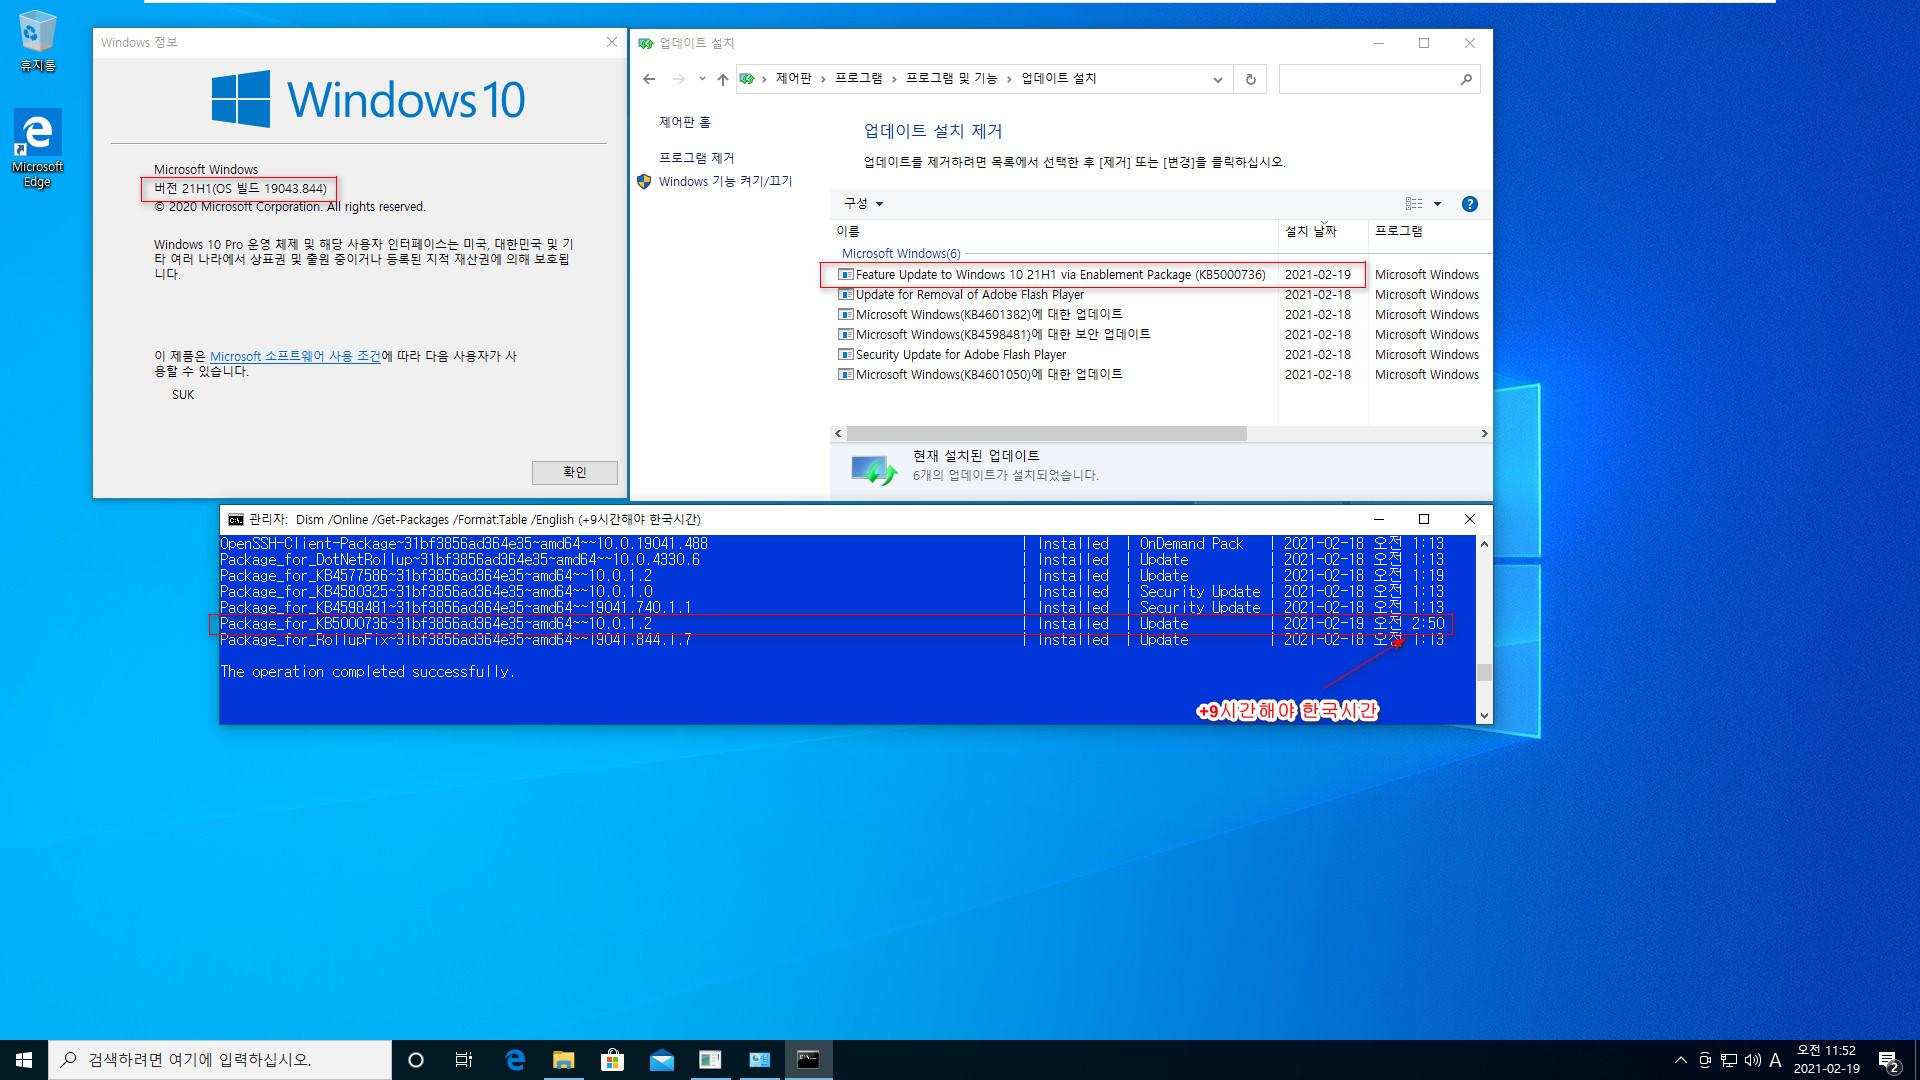 Windows 10 버전 21H1, 19043 빌드로 업그레이드 테스트 - 버전 20H2만 아니라, 버전 2004 에서도 KB5000736 설치하면 바로 업그레이드 되네요 2021-02-19_115209.jpg